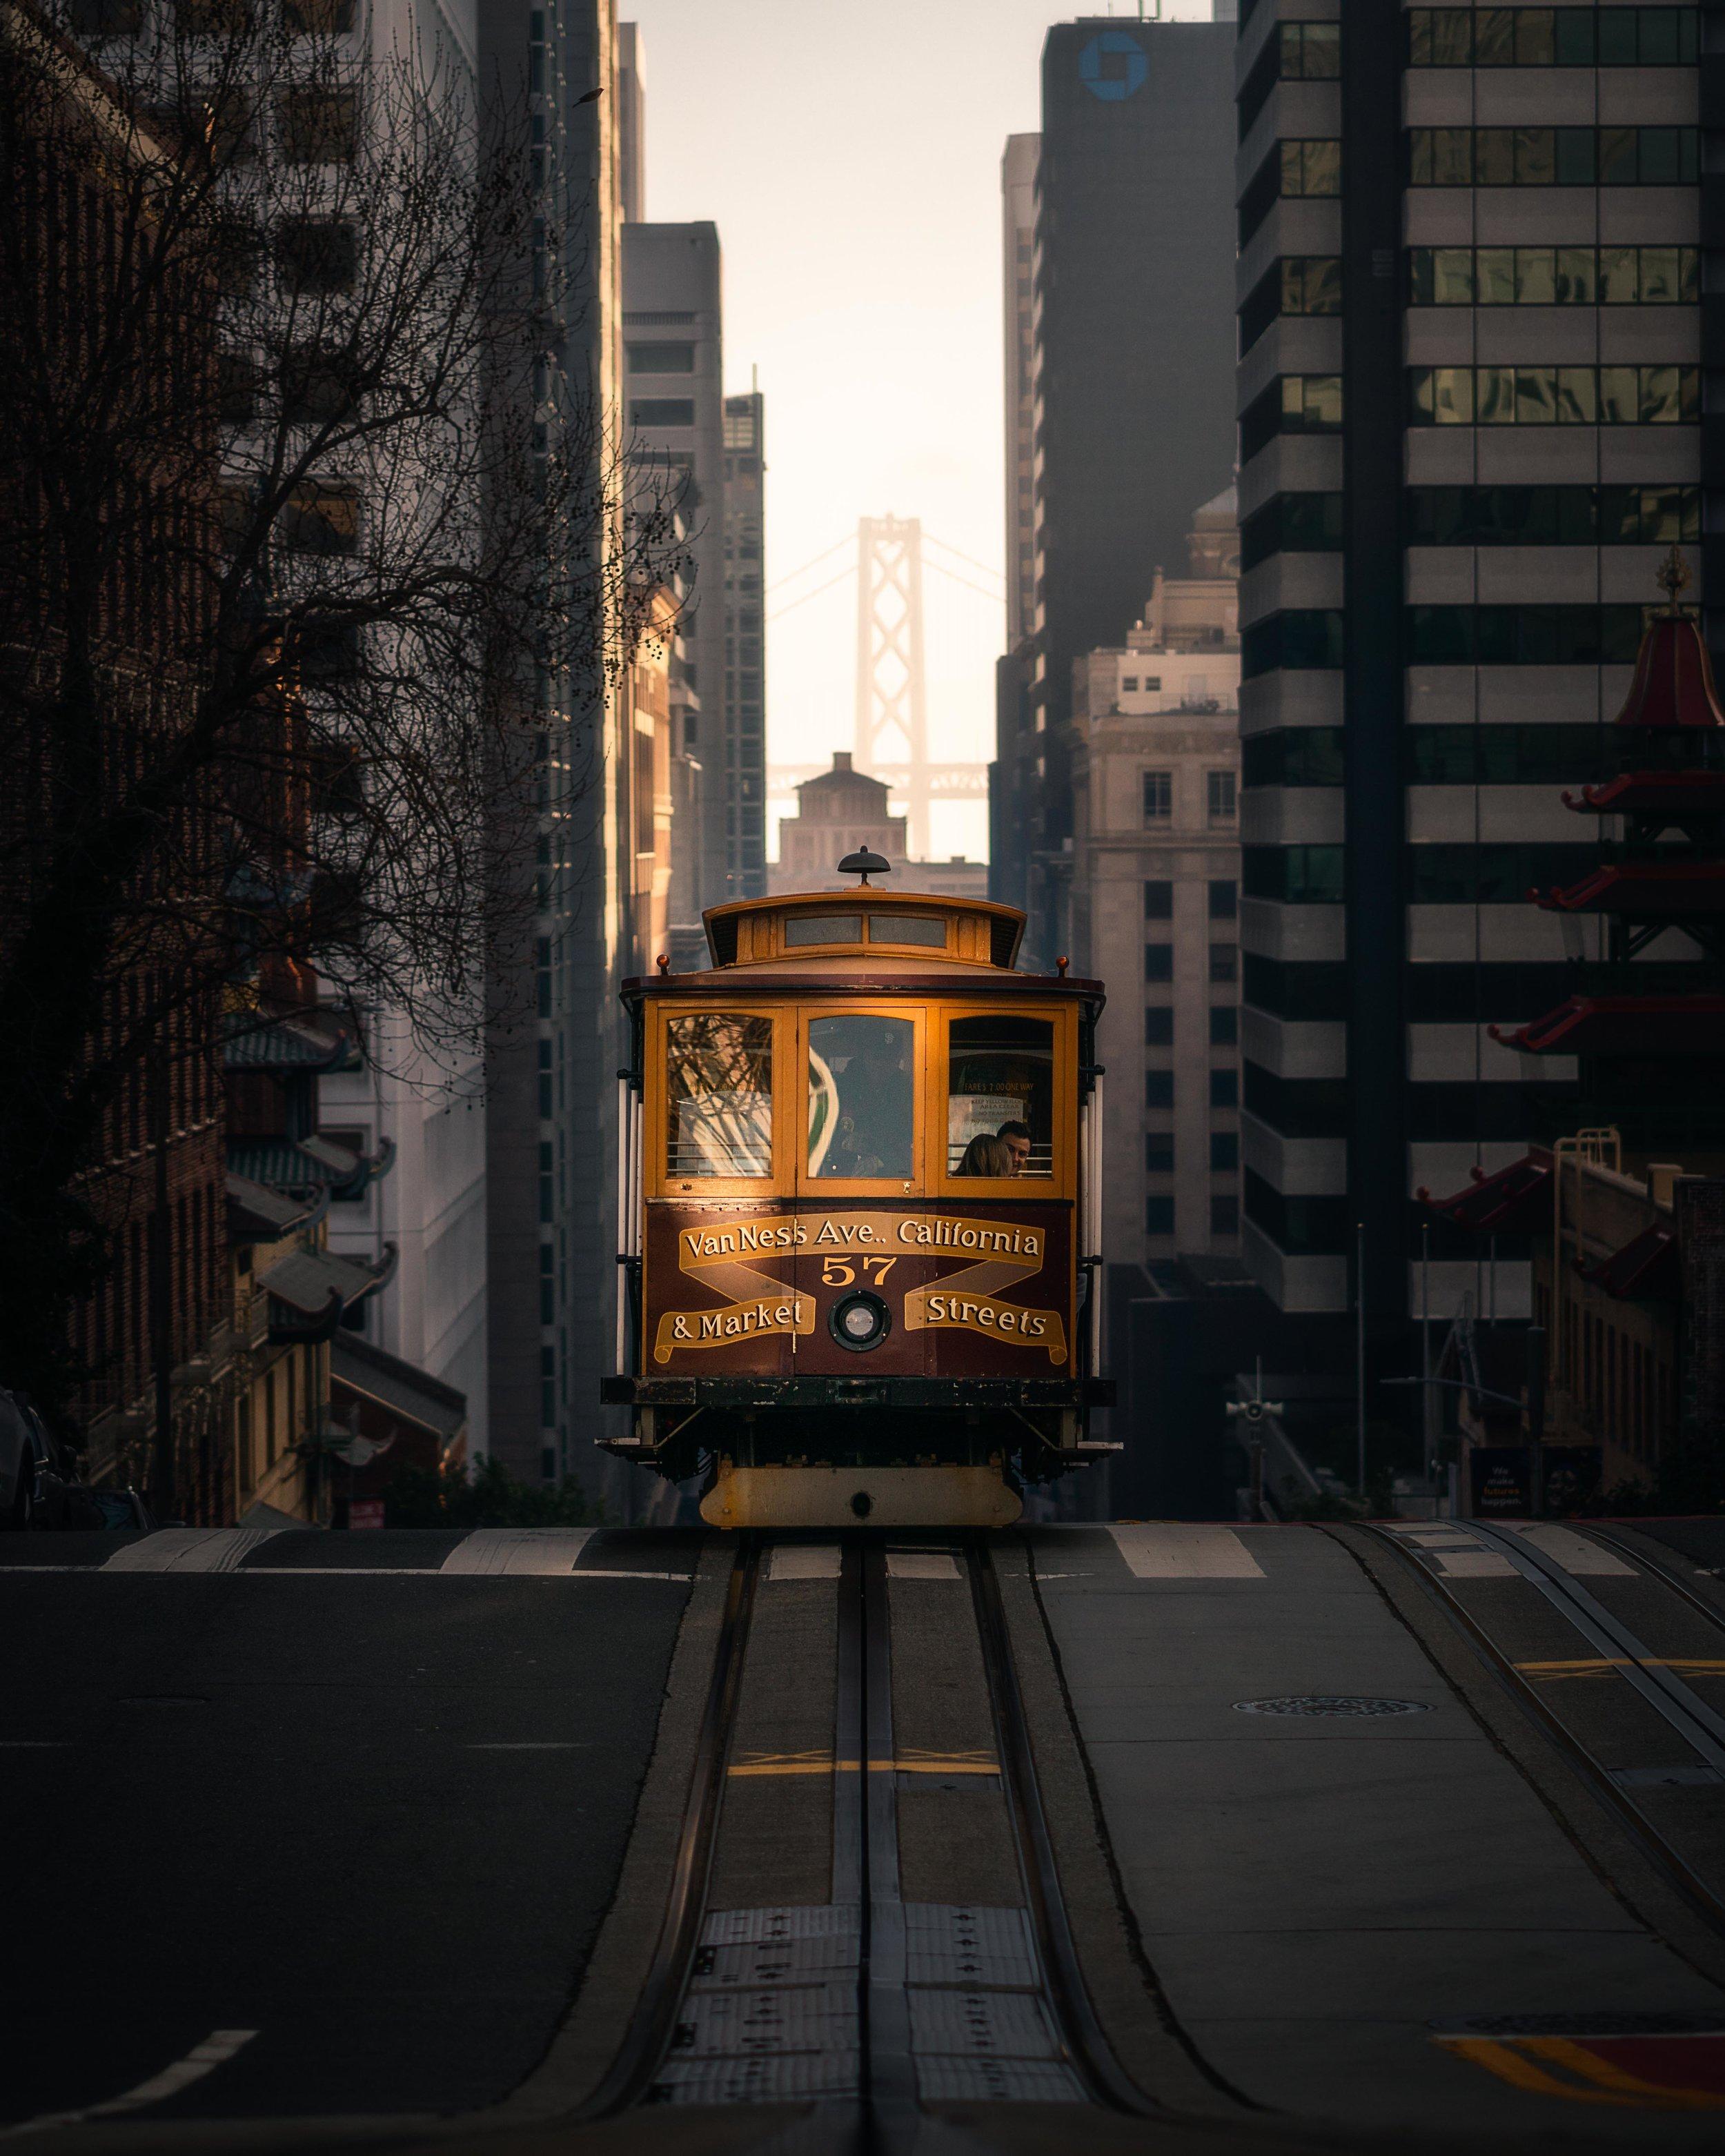 Golden Gate Bridge San Francisco Trolley Street Car California Street Sunset Sunrise Golden Hour